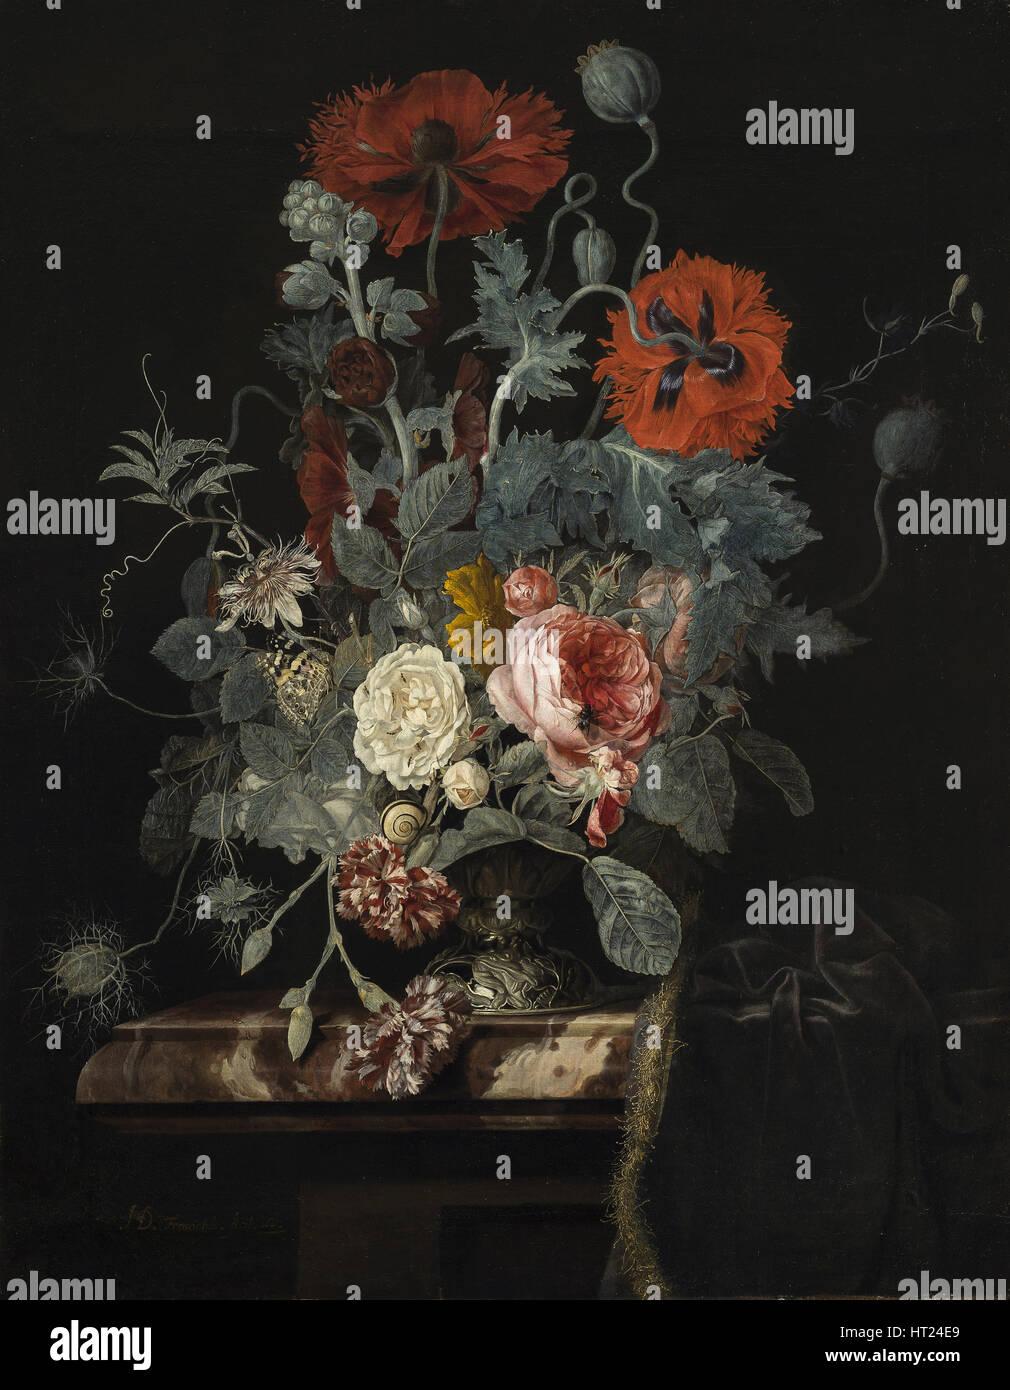 Los bodegones florales, 1665. Artista: Fromantiou, Henri de (c. 1633/34-después de 1693) Imagen De Stock